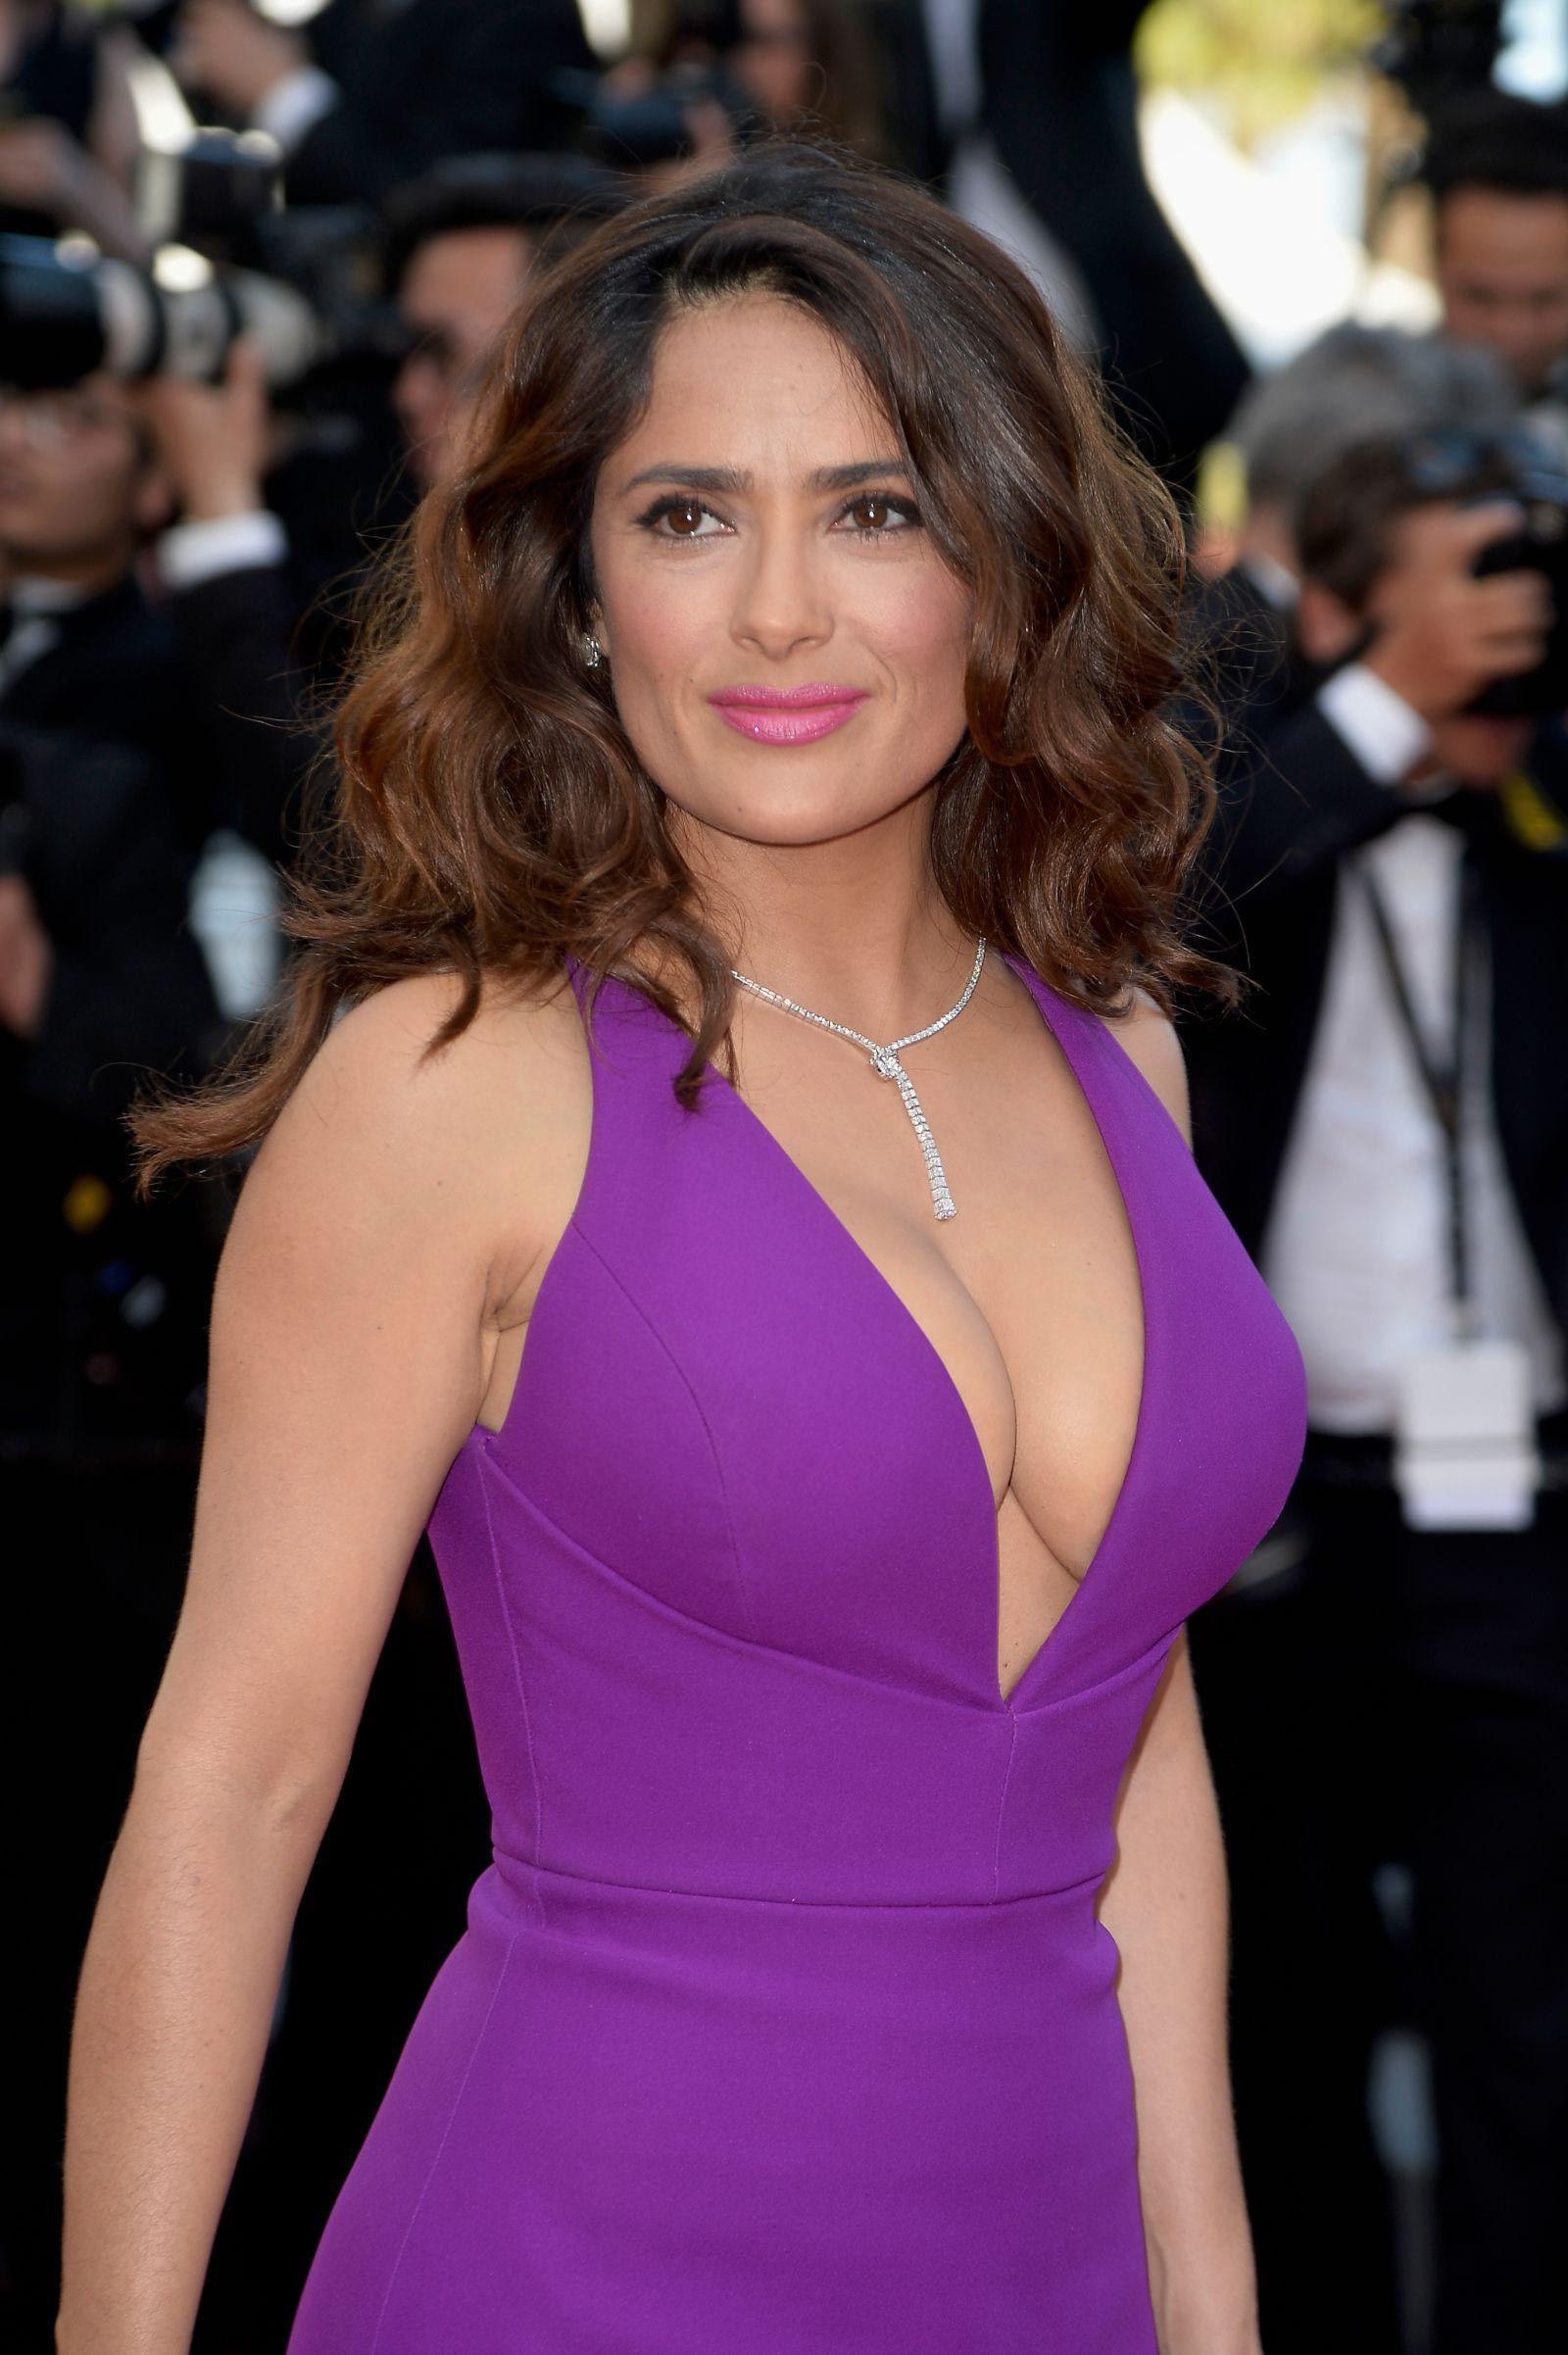 Salma Hayek (4) | Hot Celebs Home Salma Hayek